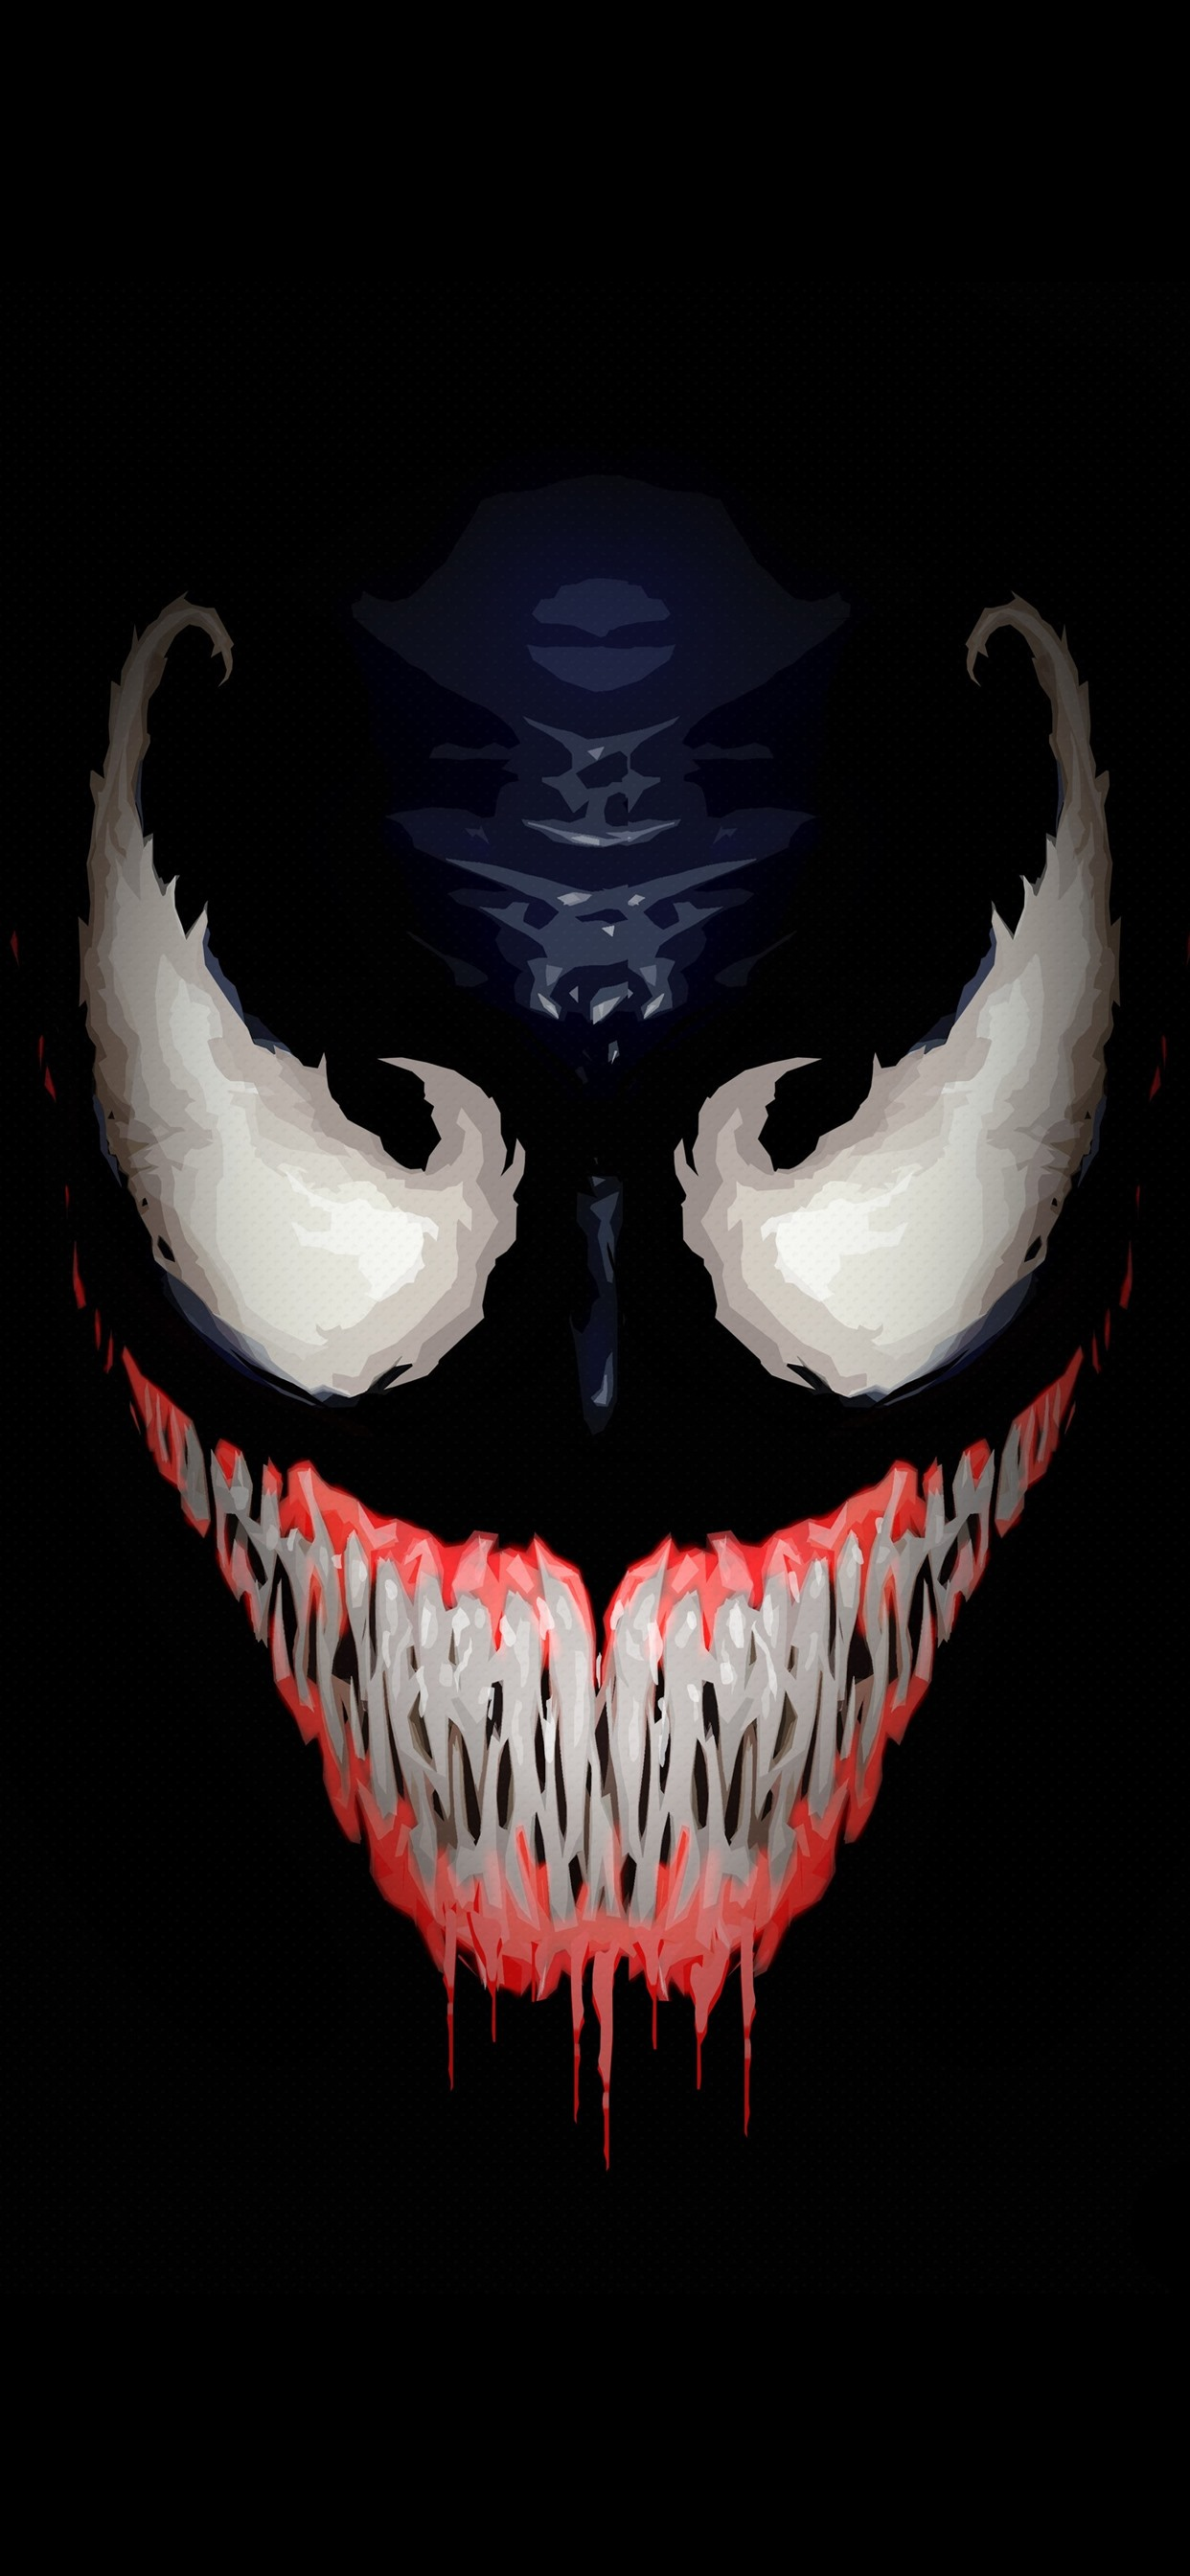 Wallpaper Venom Face Teeth Black Background Art Picture